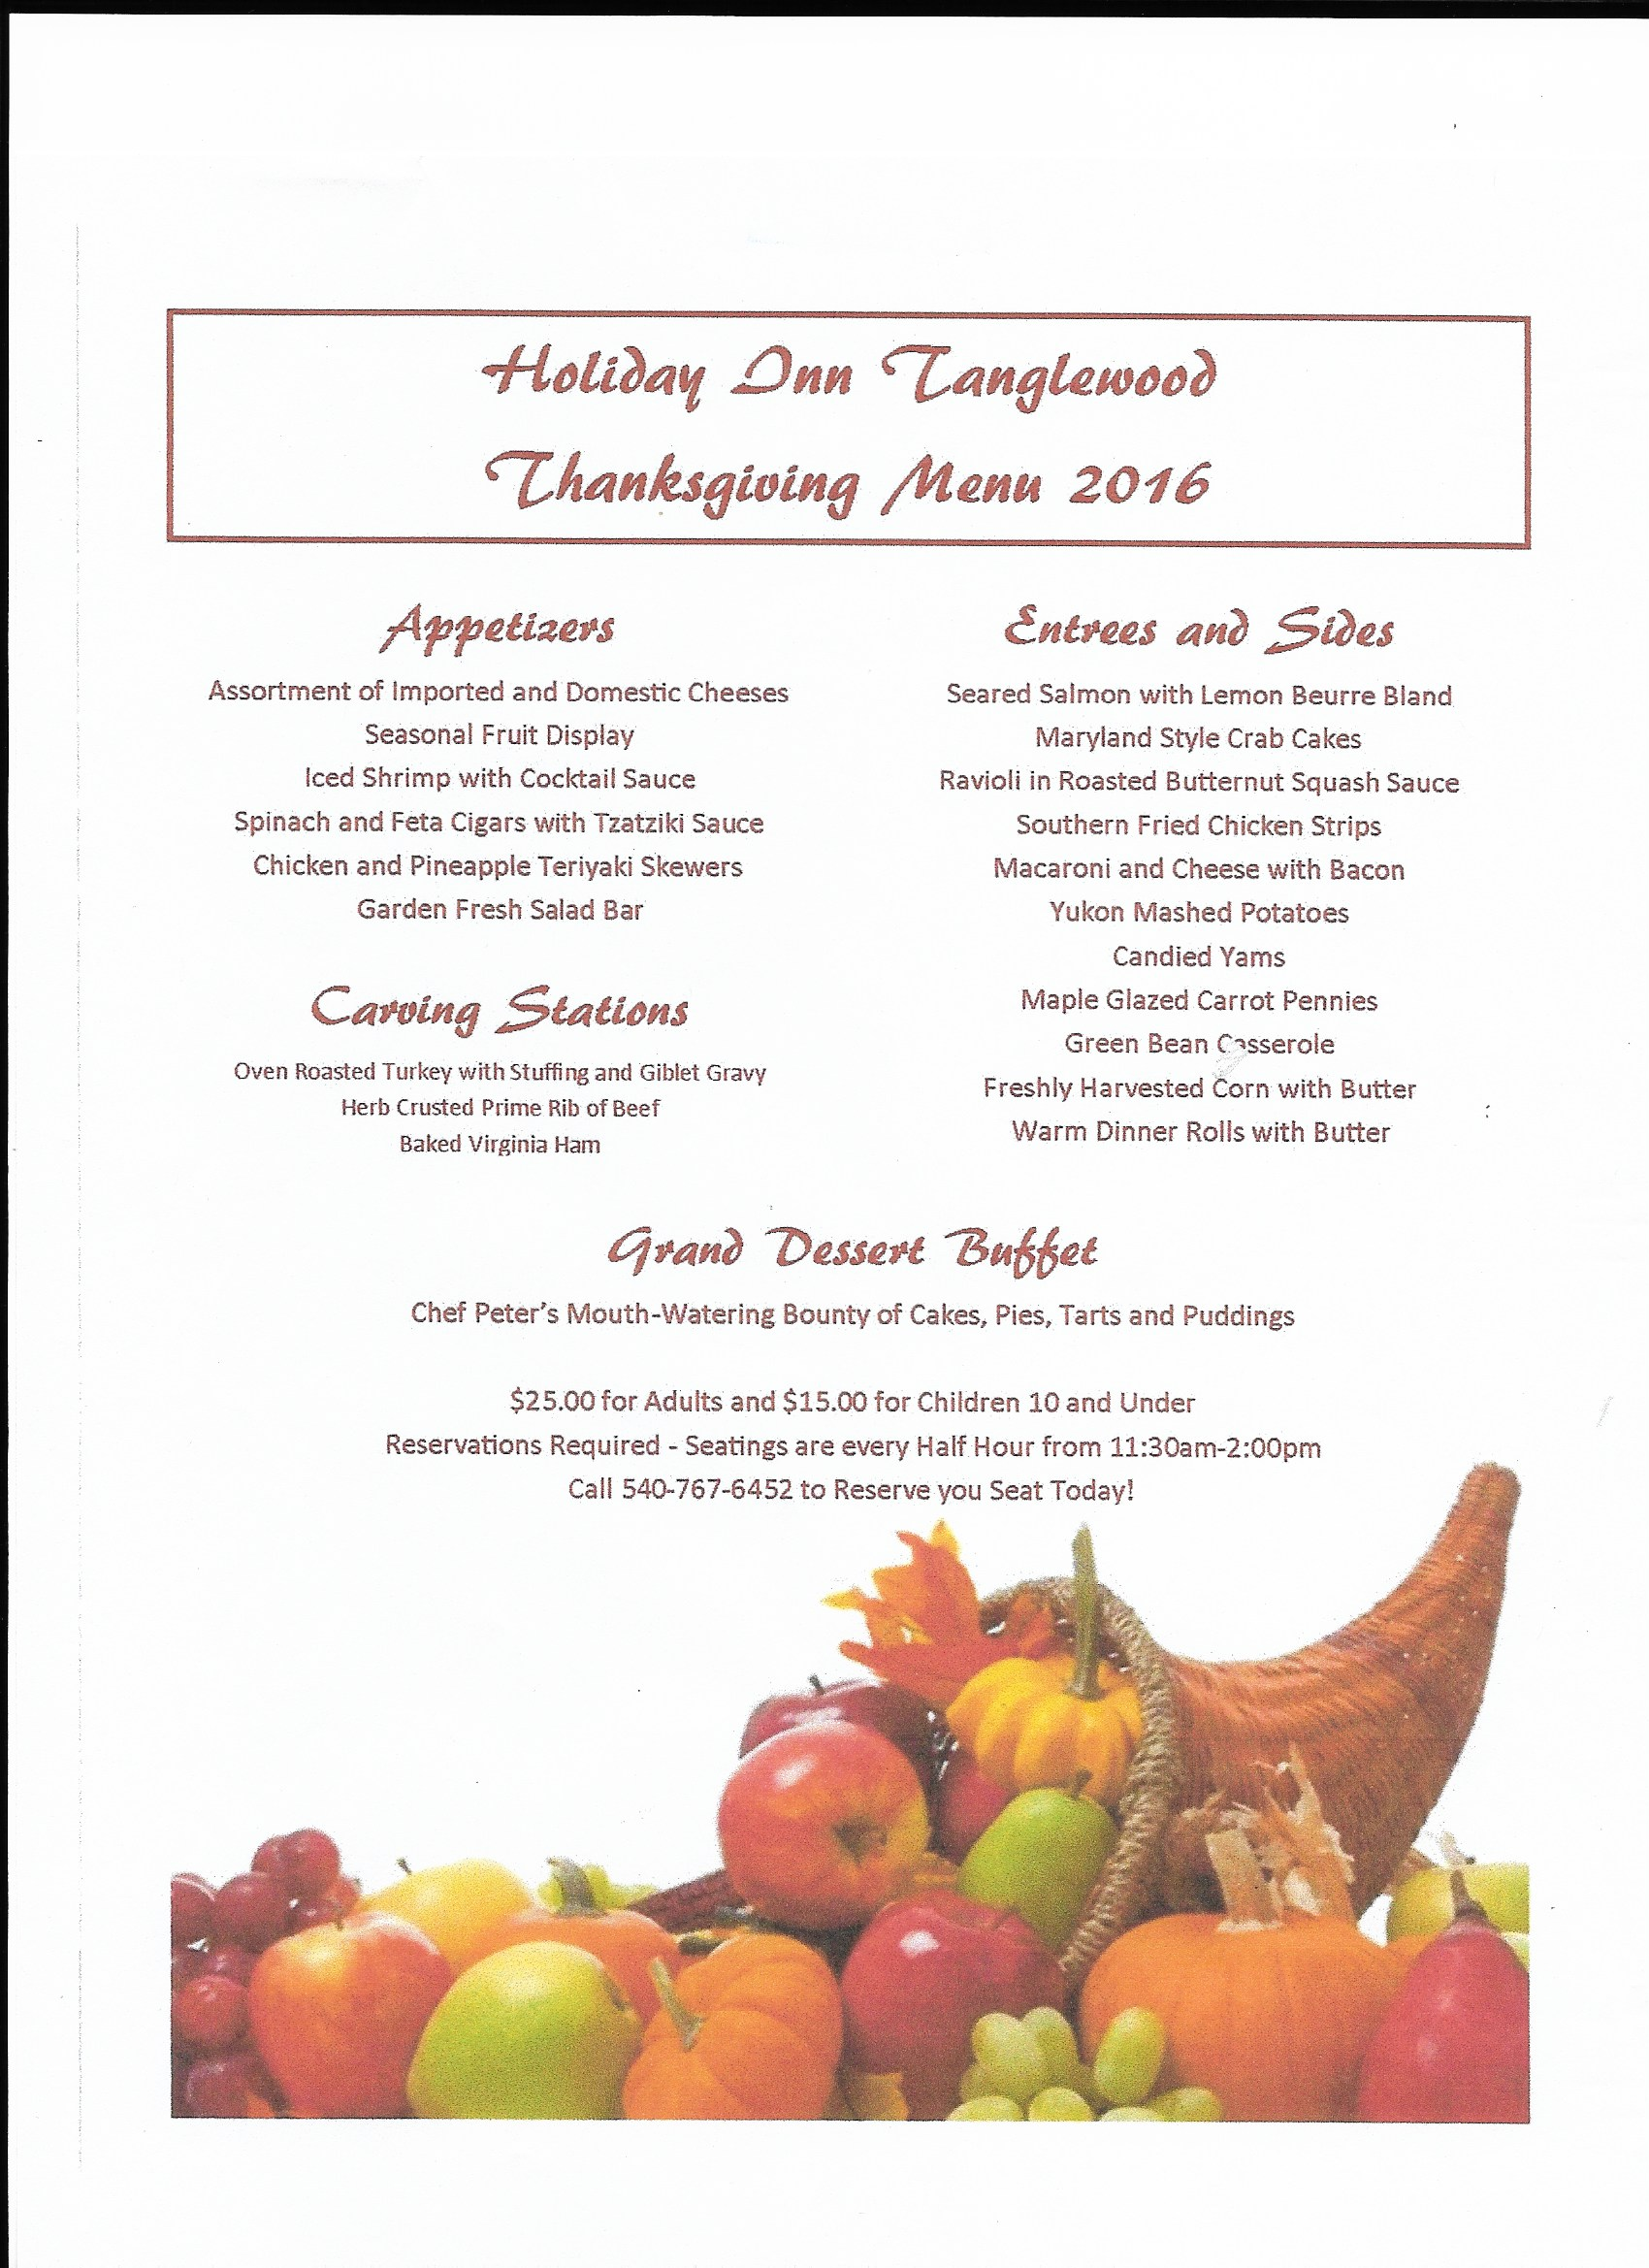 Hotel Roanoke Thanksgiving